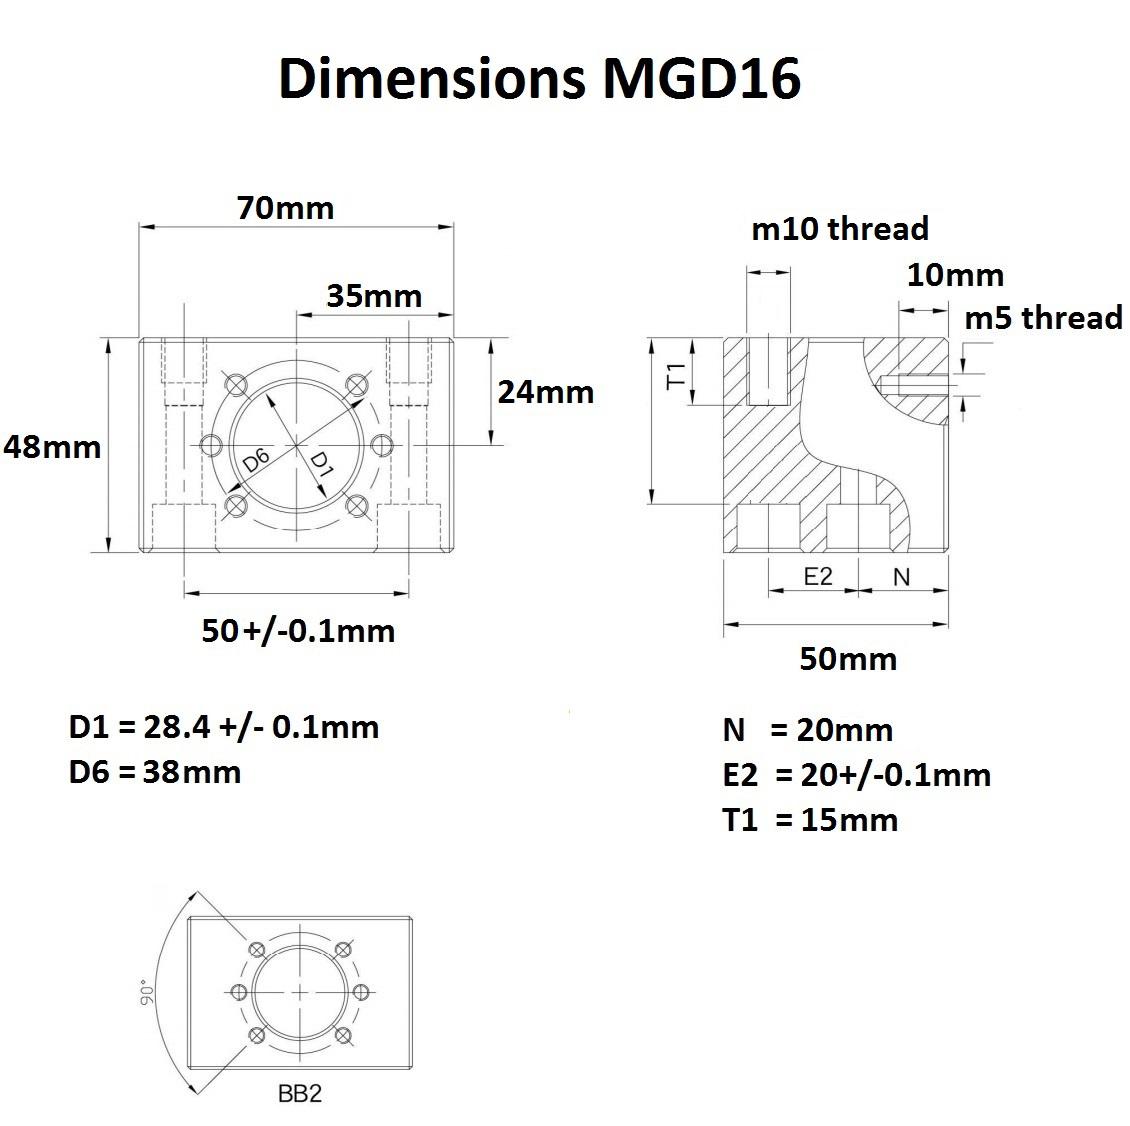 46962 mgd16 dimensions